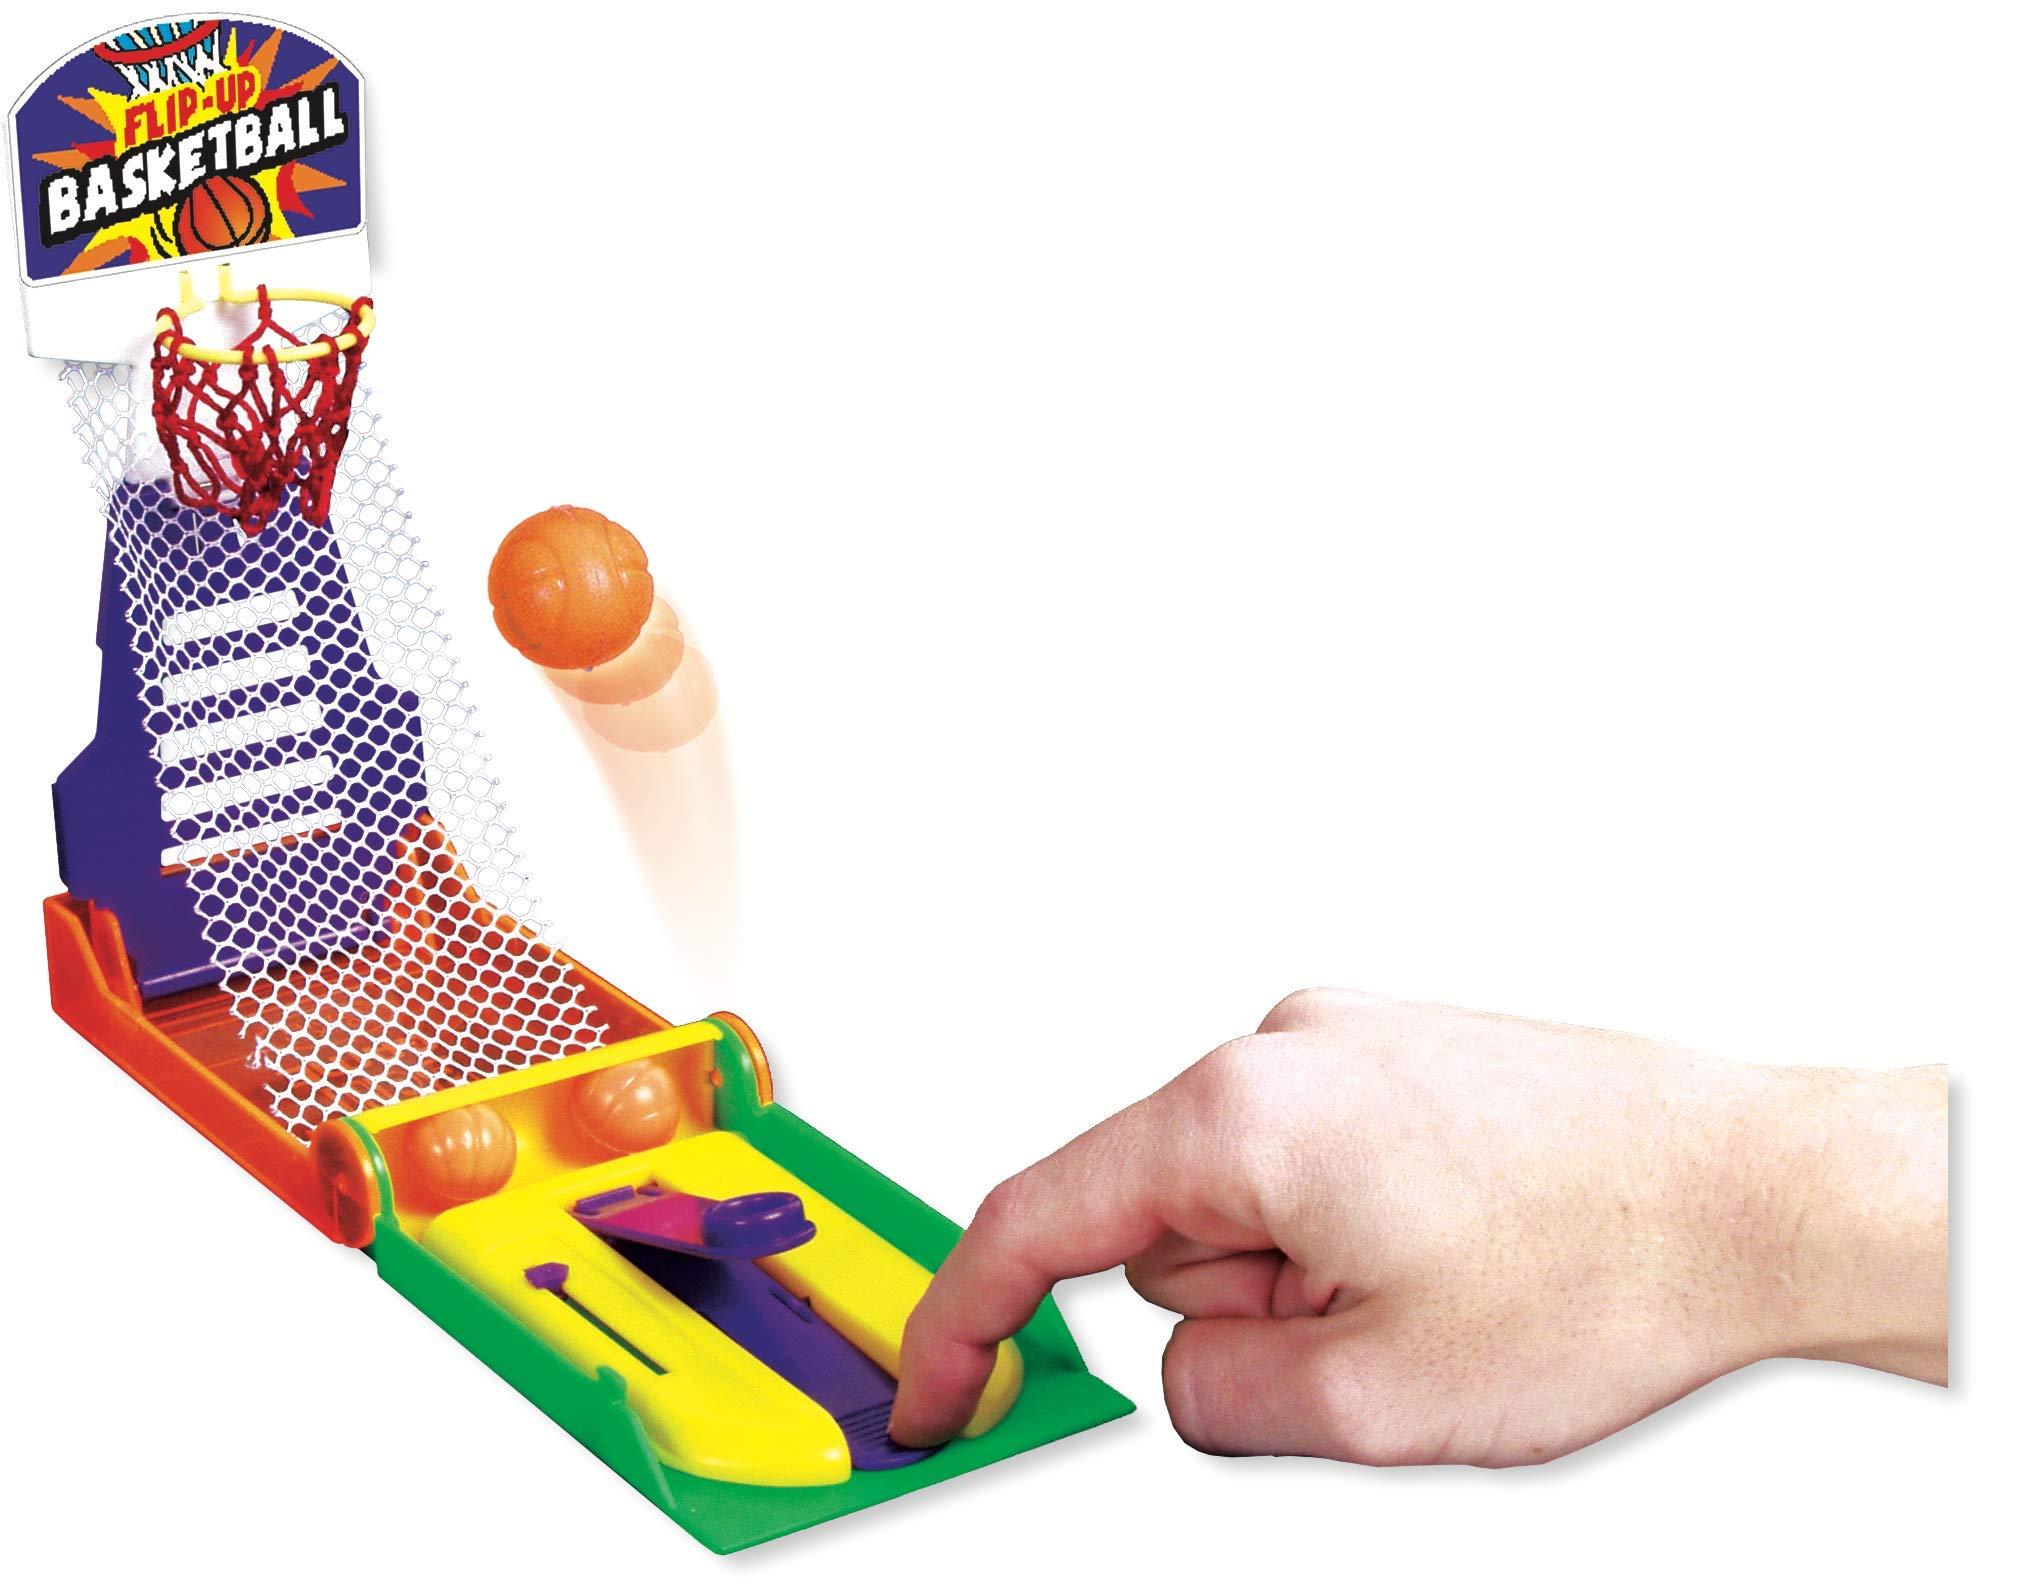 JA-RU Basketball Pocket Travel Game (144 Units) and one Bouncy Ball Item #3255-144p by JA-RU (Image #1)